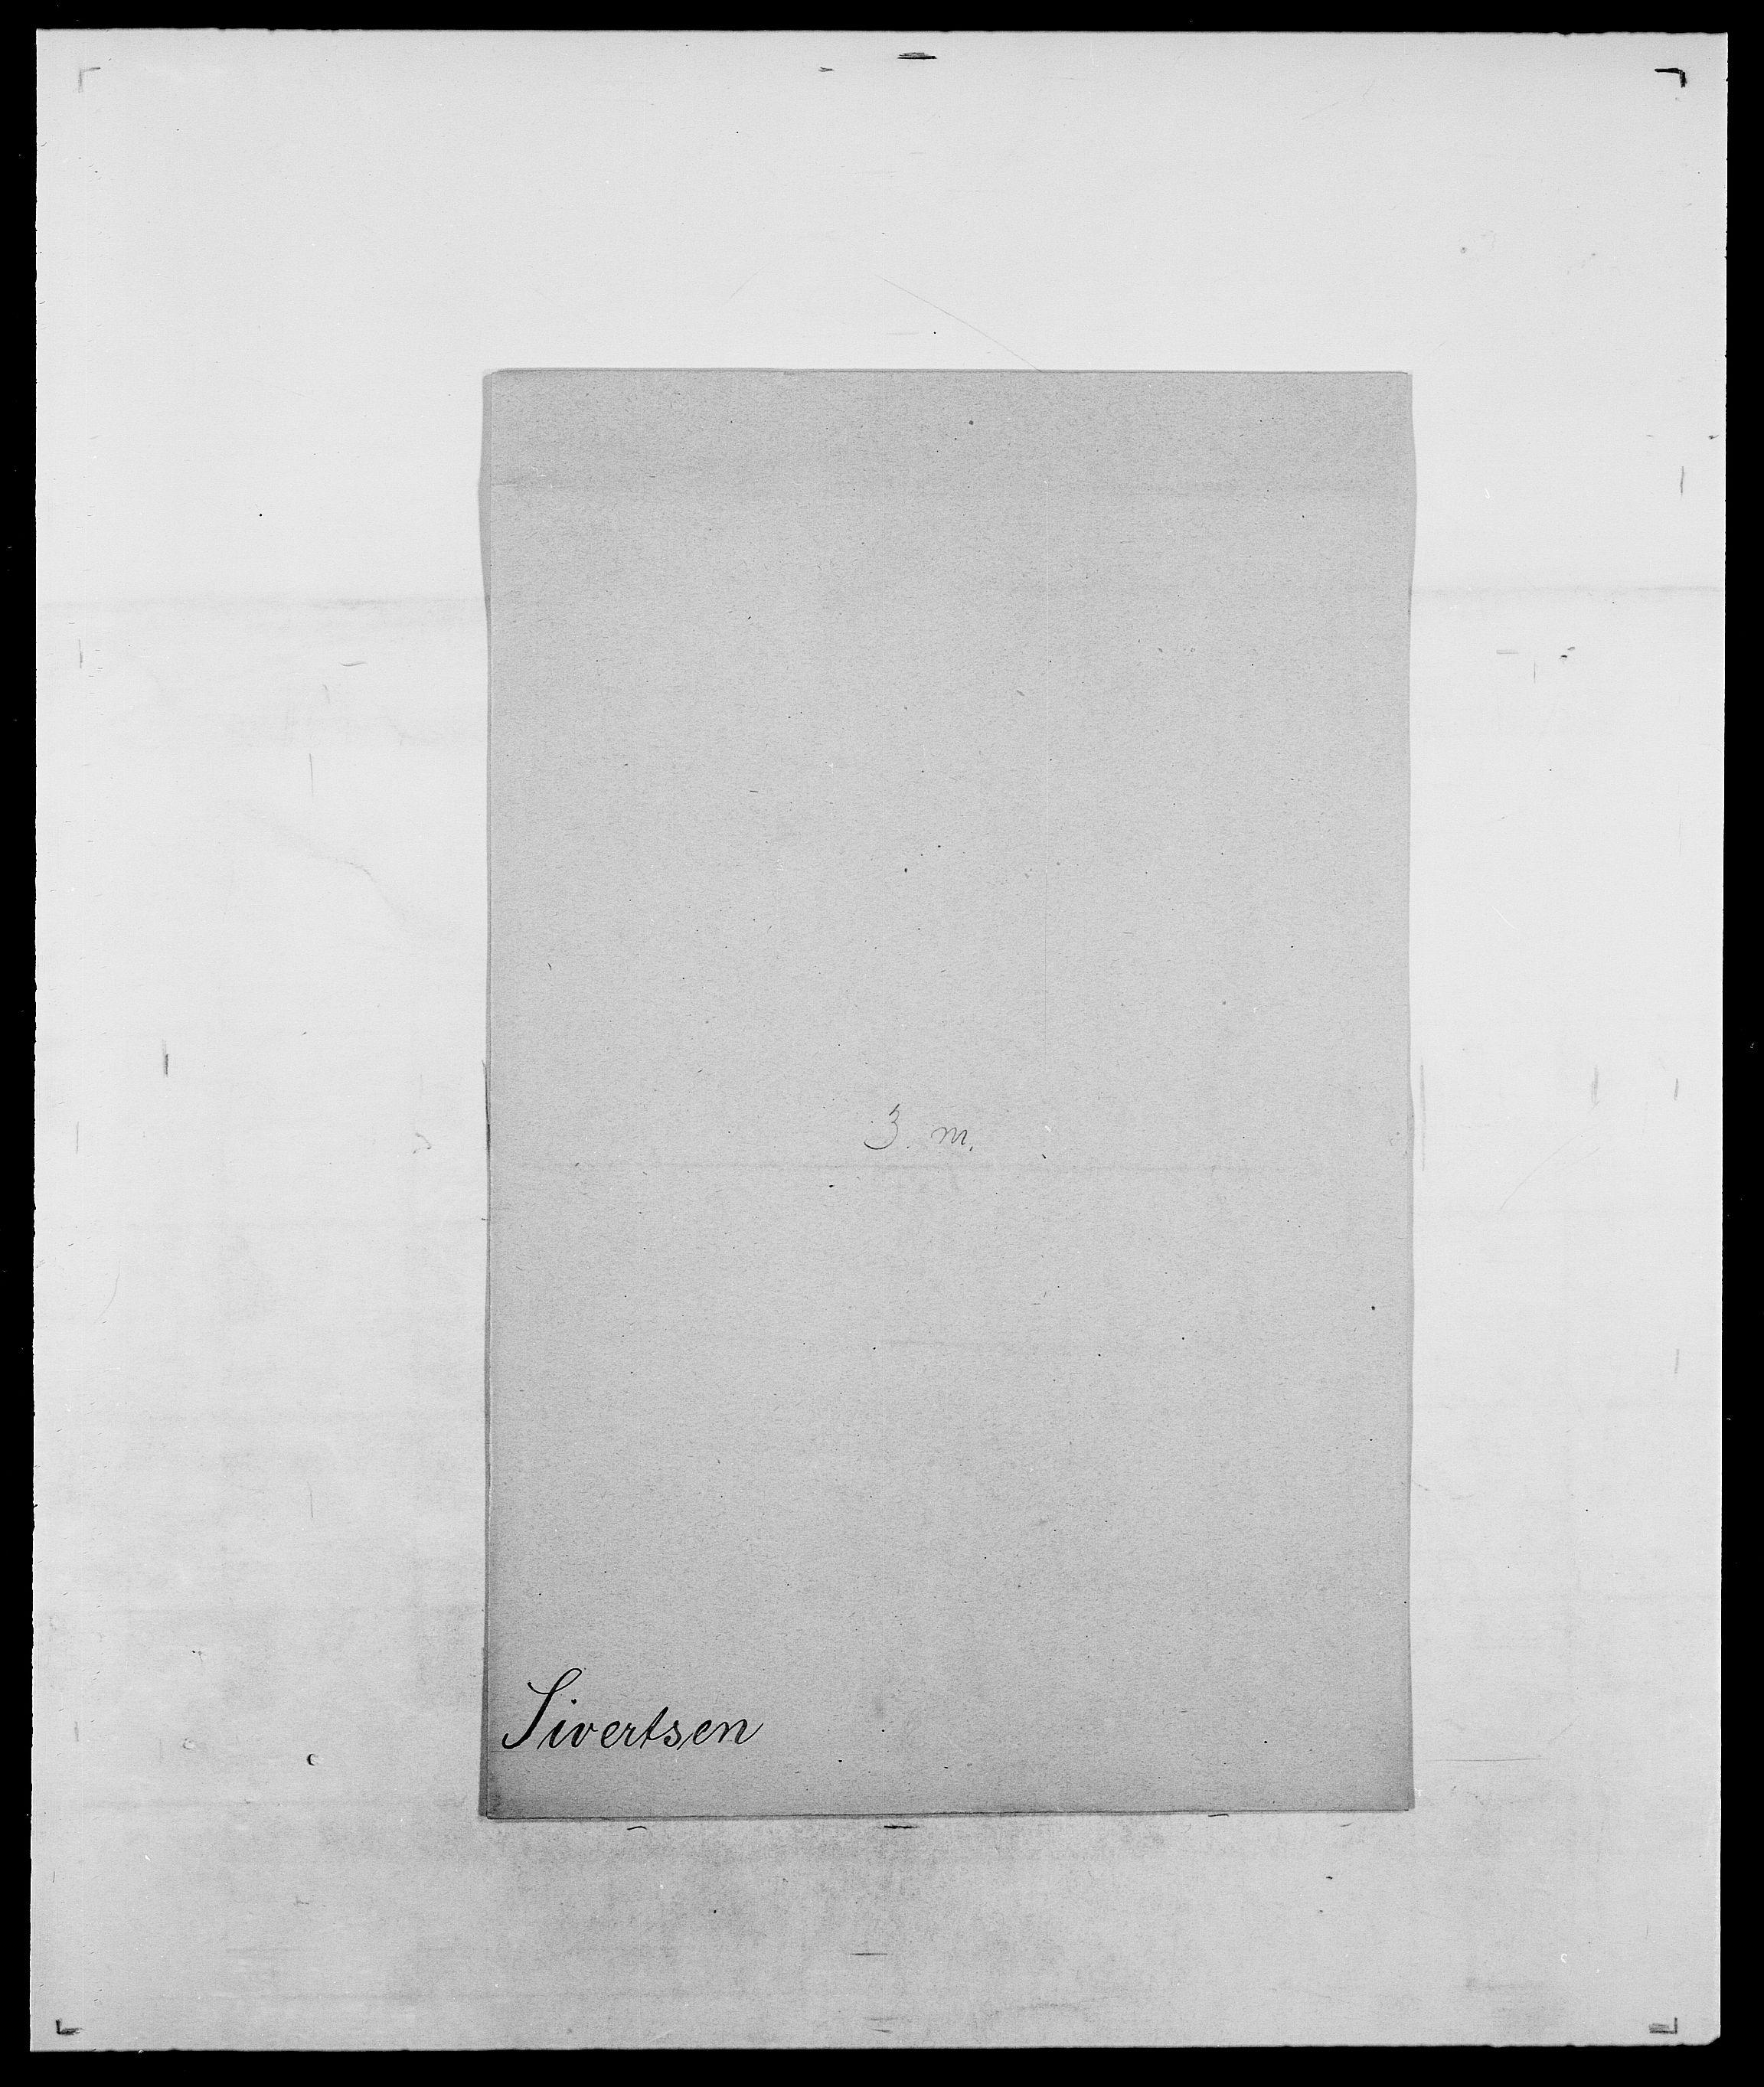 SAO, Delgobe, Charles Antoine - samling, D/Da/L0035: Schnabel - sjetman, s. 989